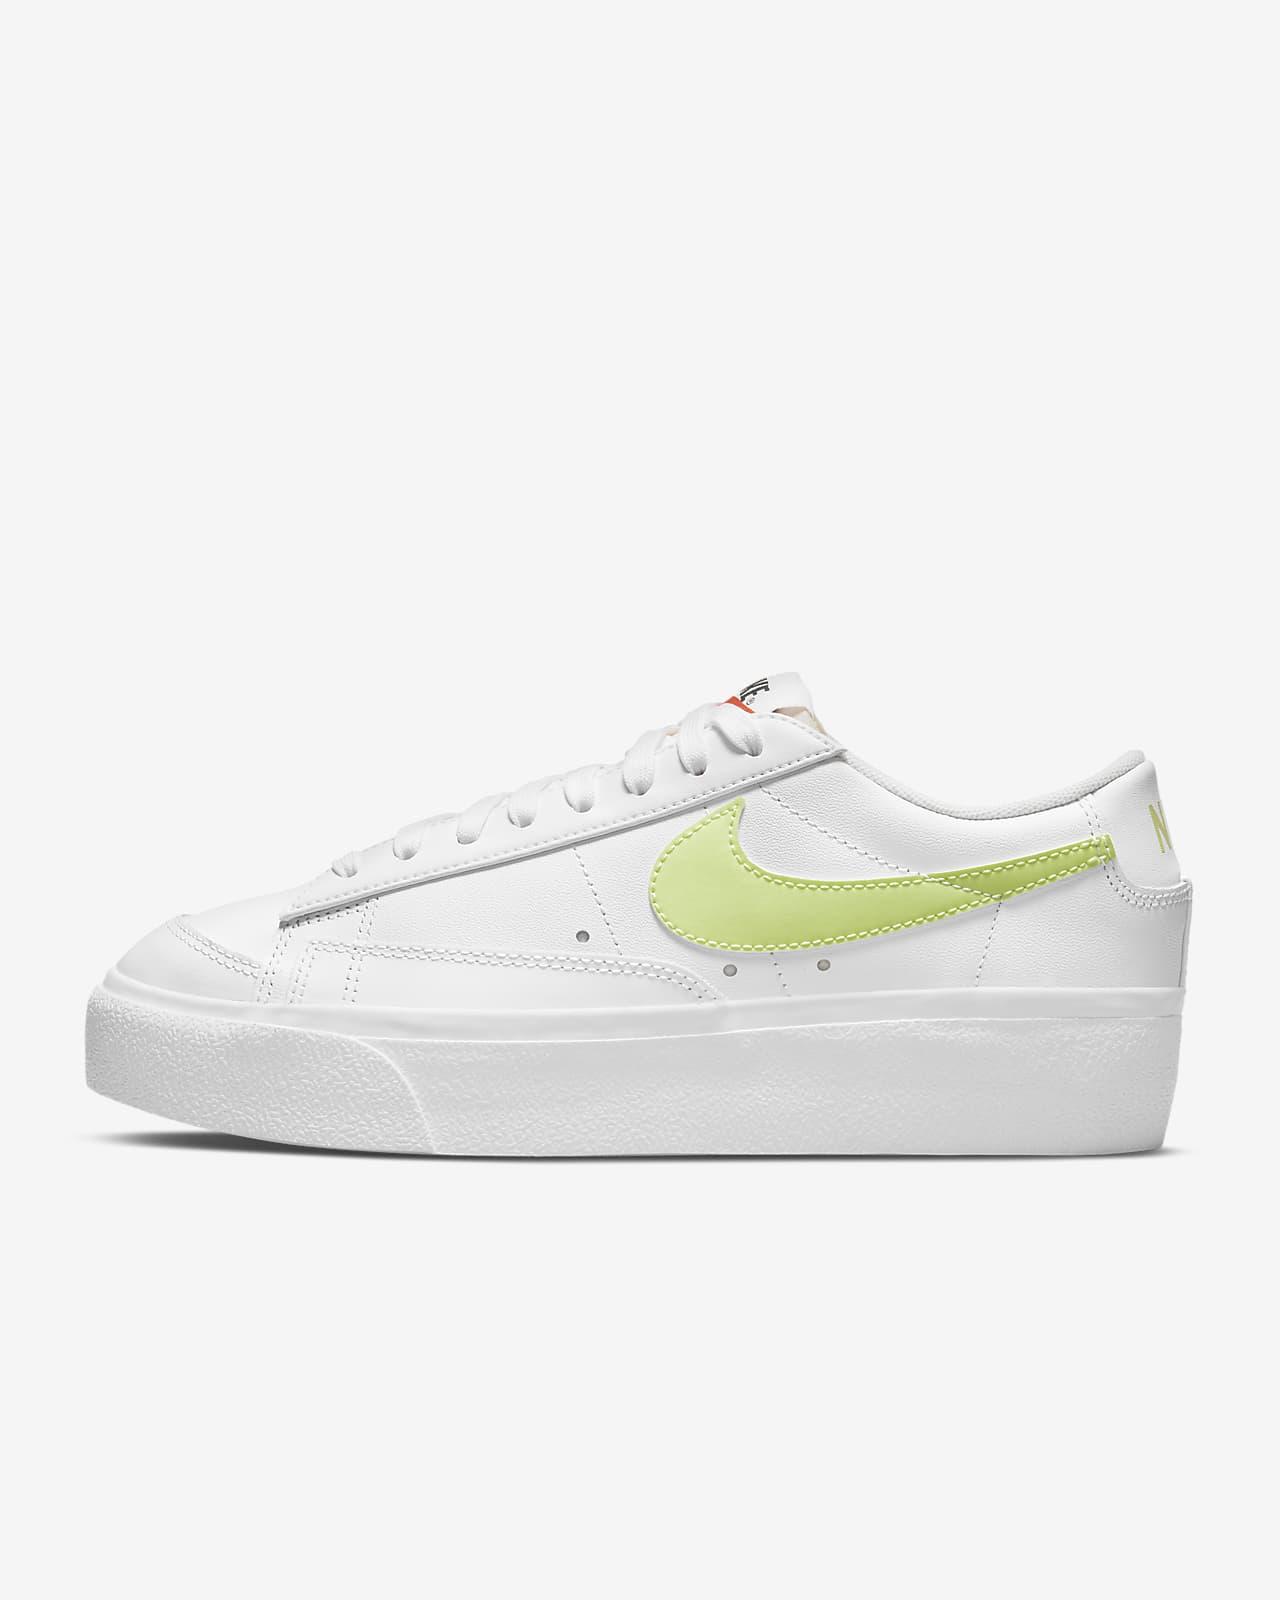 Calzado Nike Blazer Low Platform para mujer